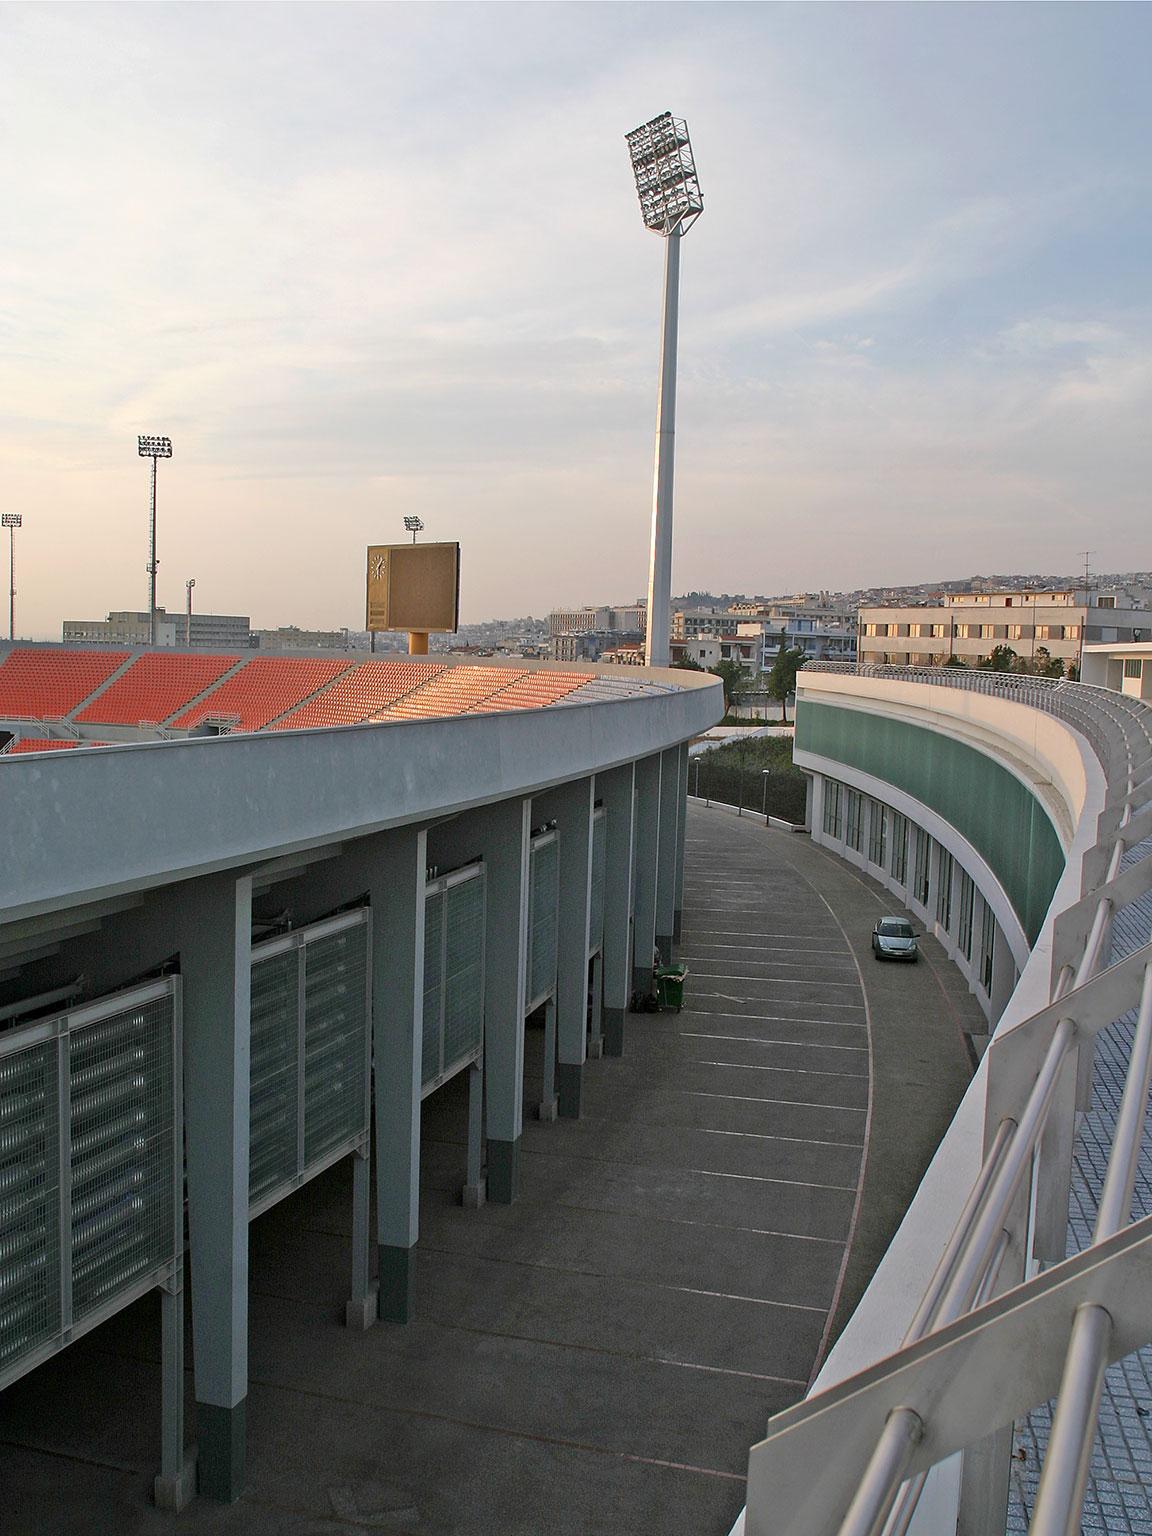 Kaftantzoglio Stadium